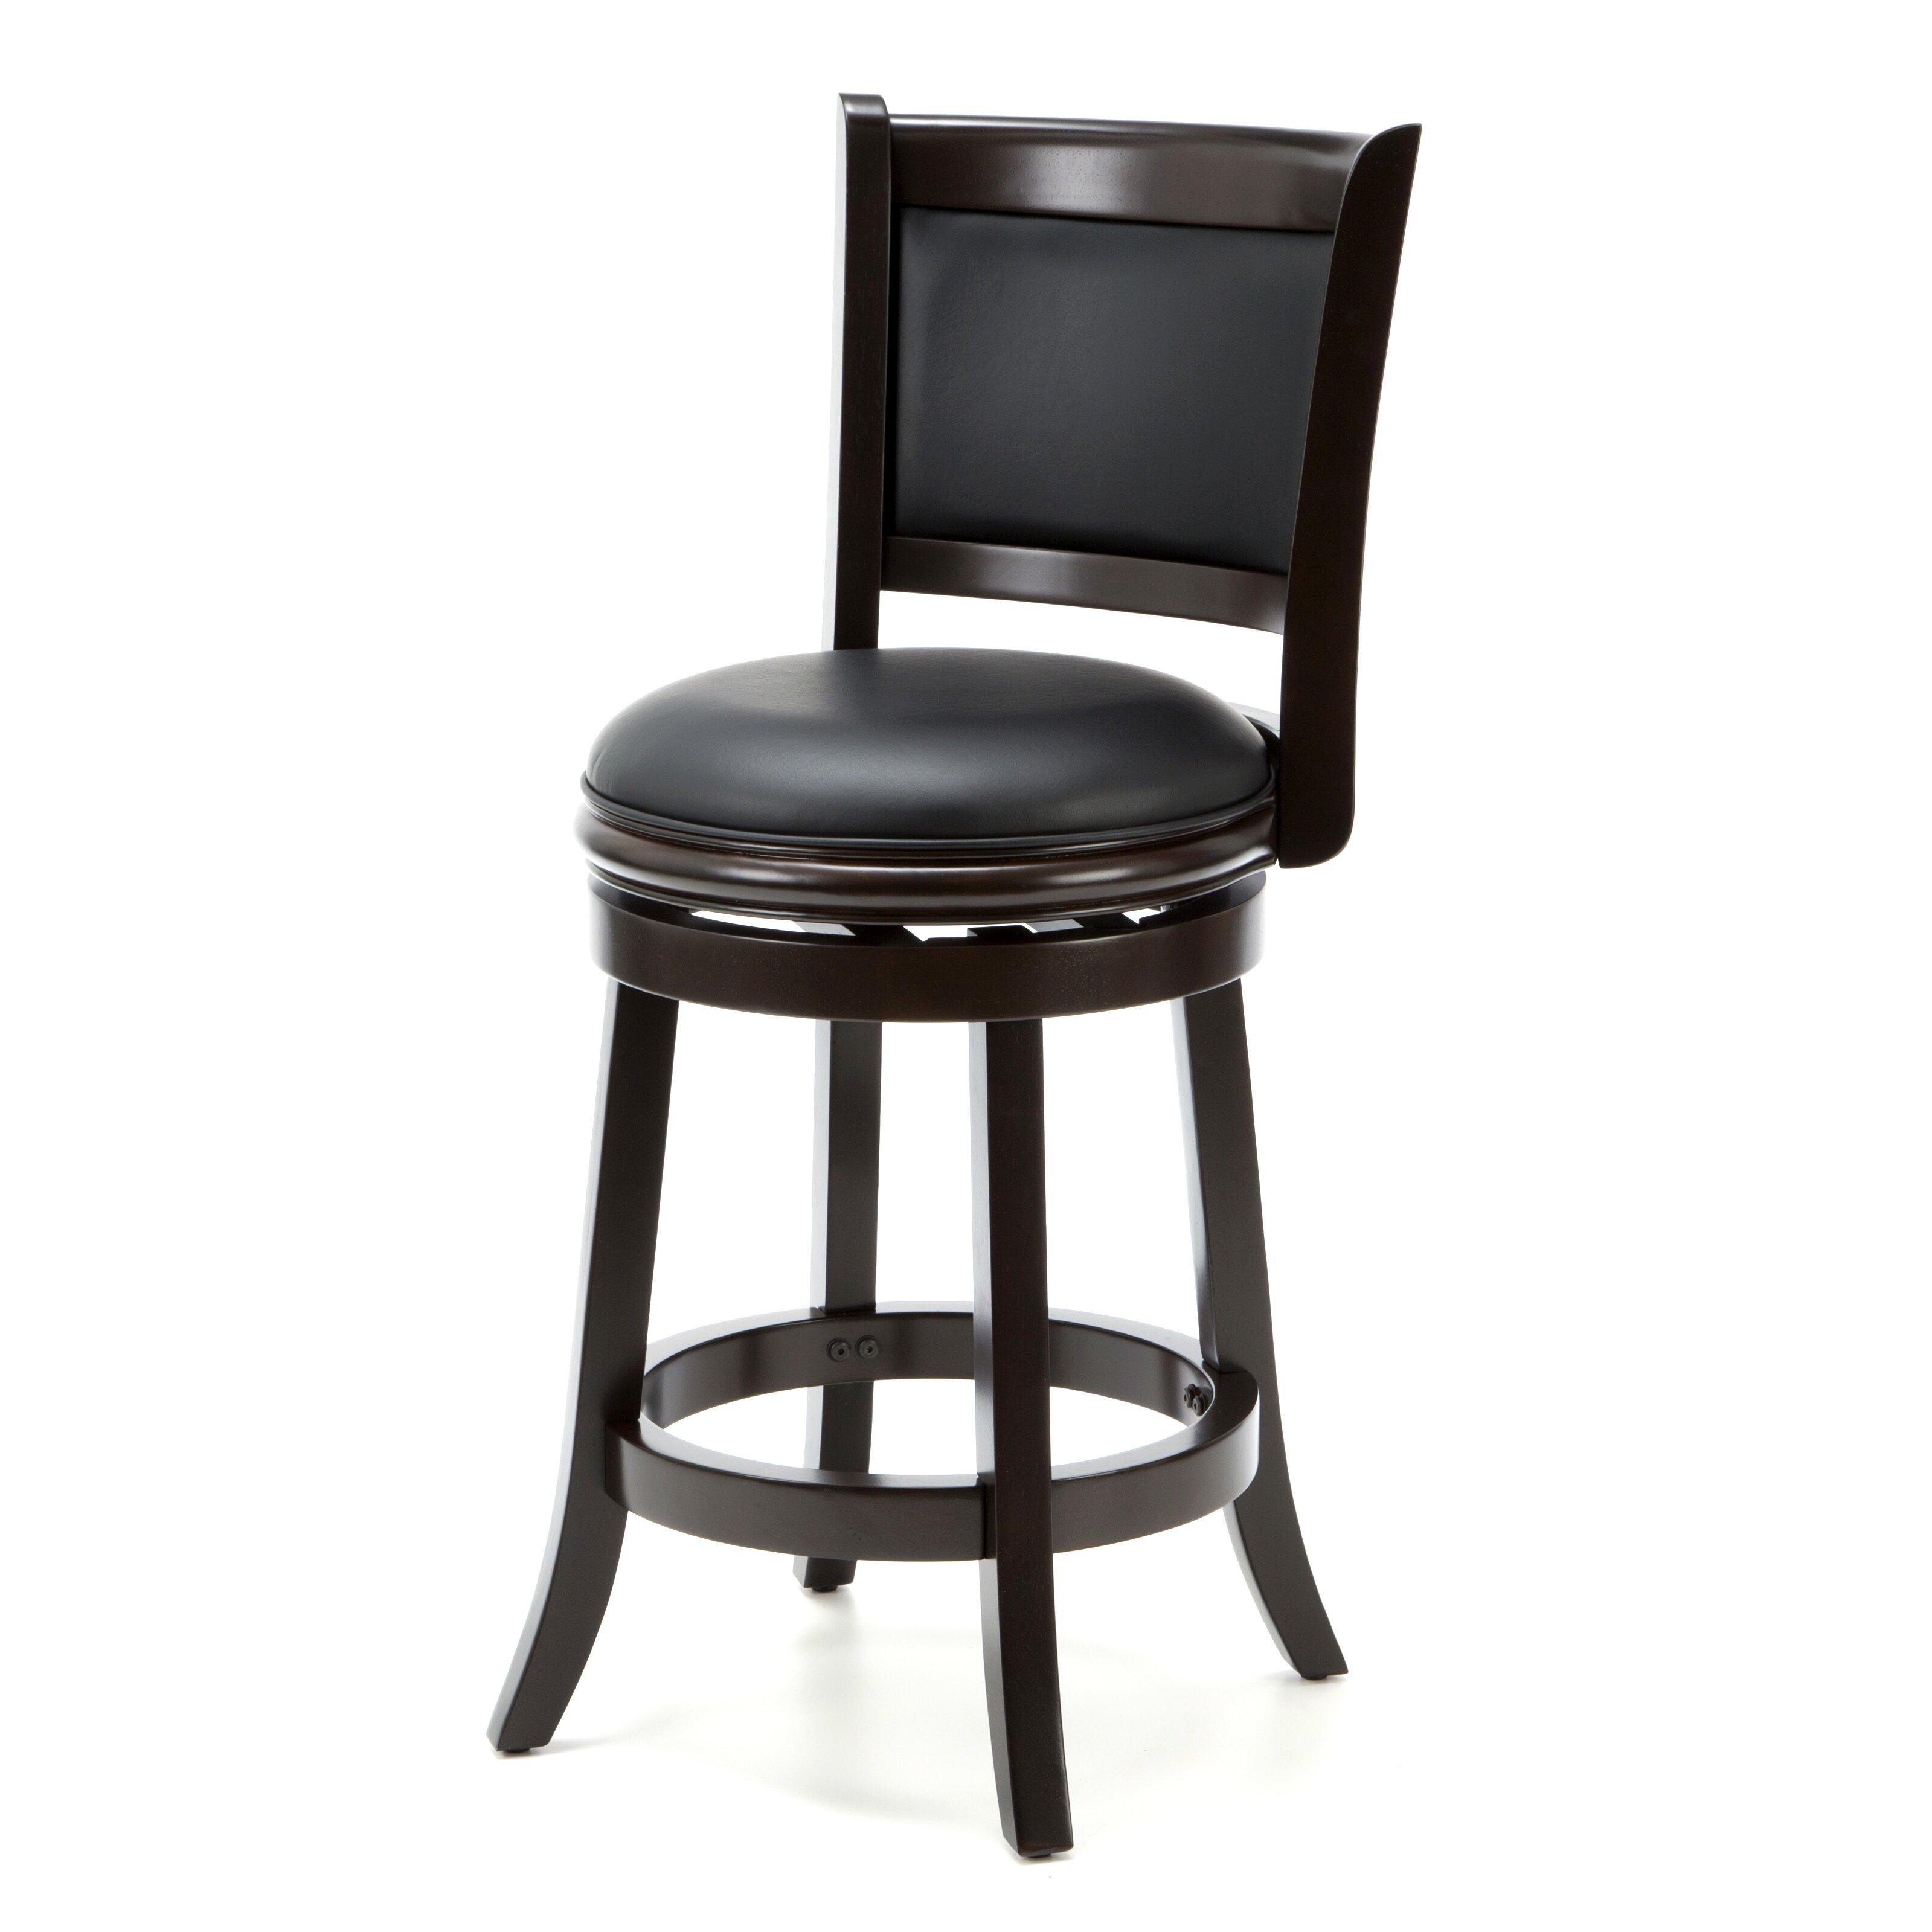 "Boraam Augusta 24 In Swivel Counter Stool: Darby Home Co Orangeville 24"" Swivel Bar Stool With"